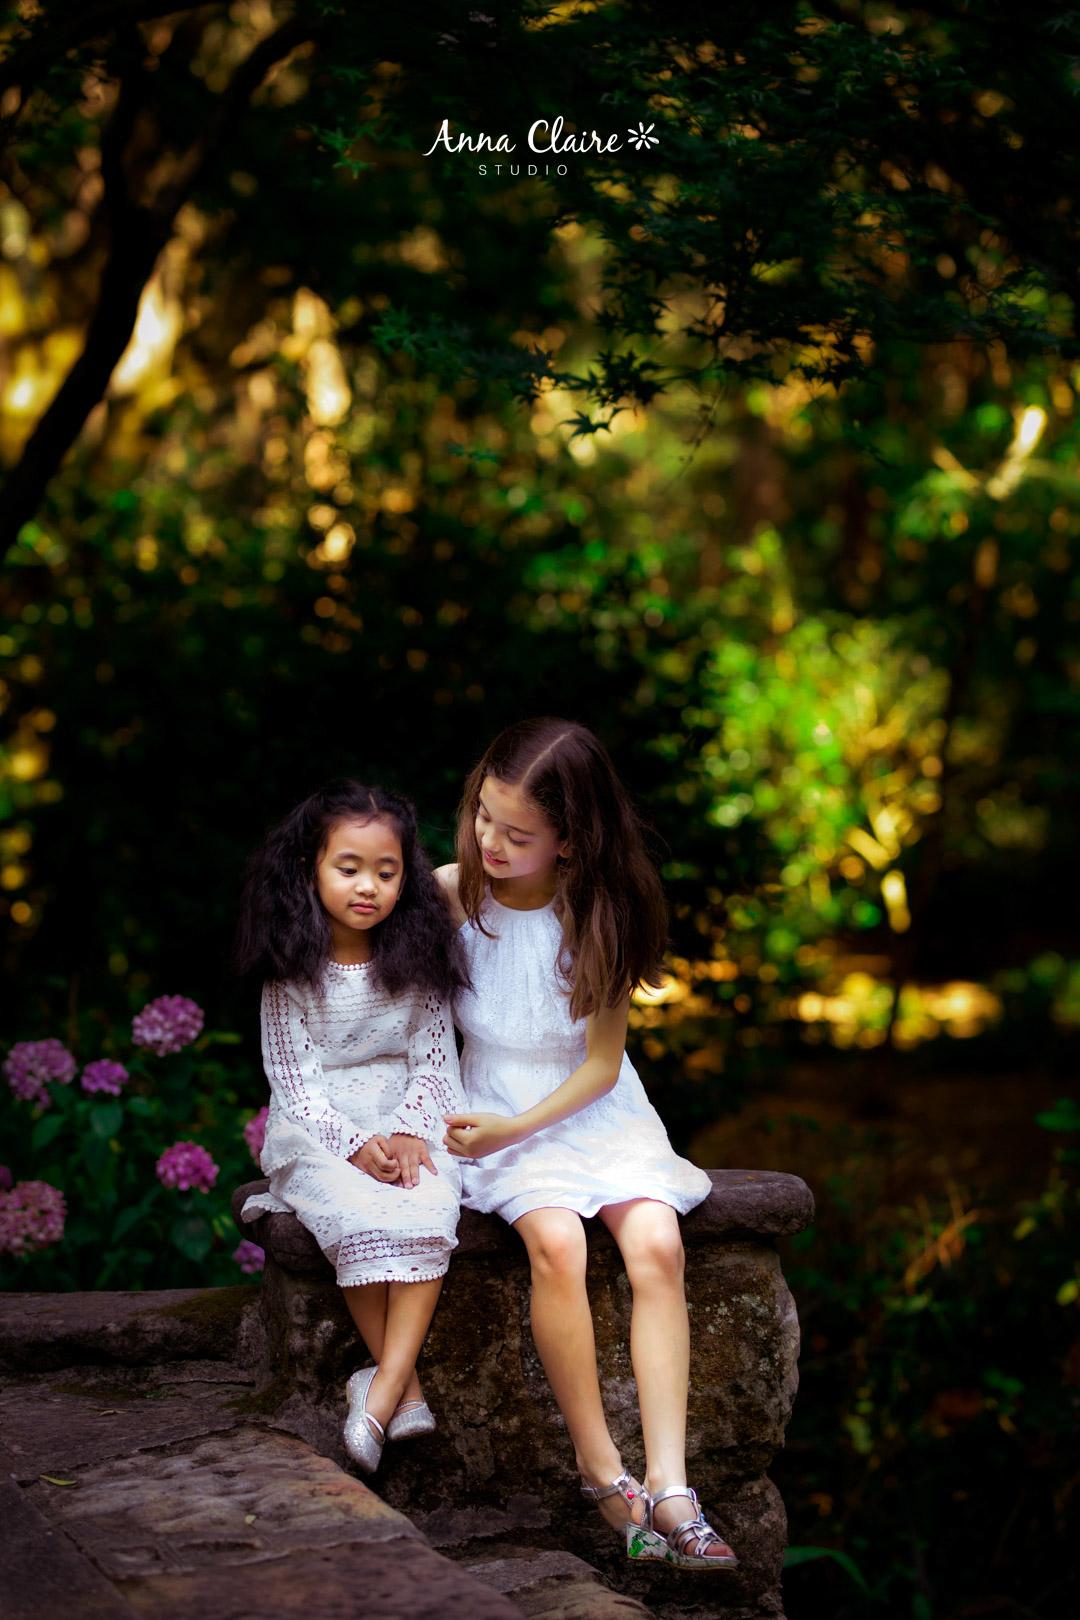 AnnaClaire Studio KIDS photo 悉尼儿童摄影